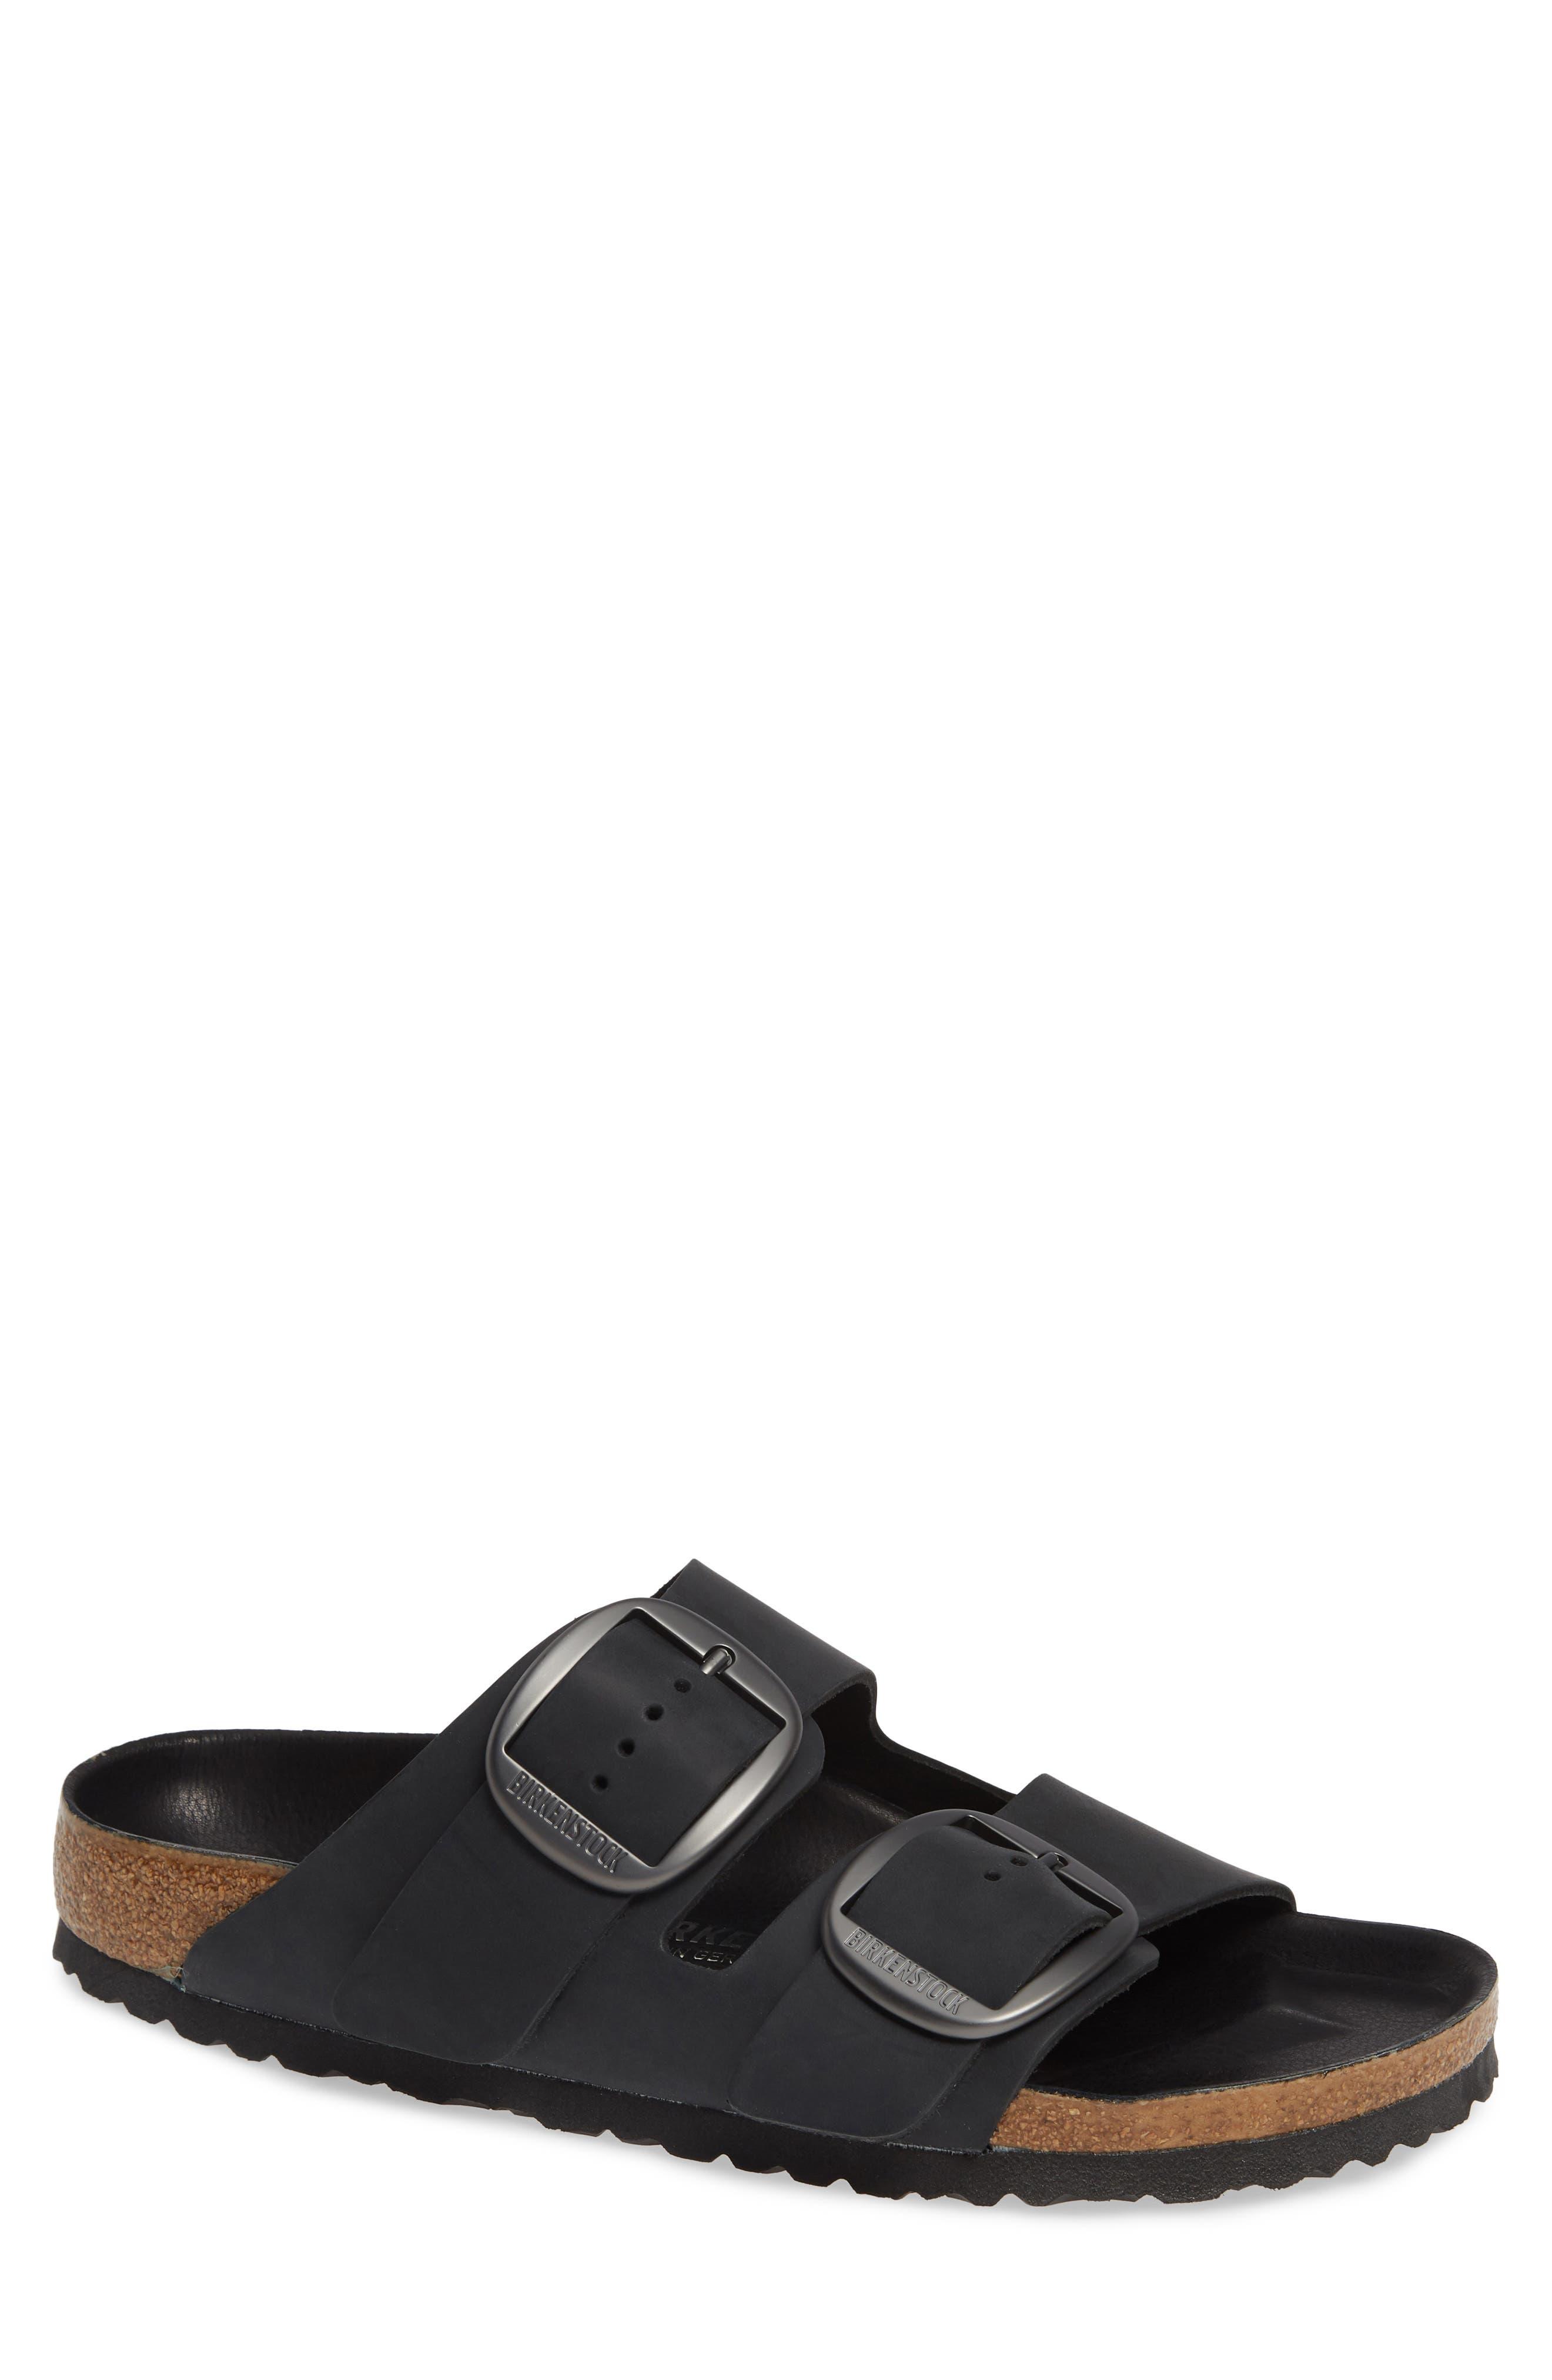 Birkenstock Arizona Big Buckle Slide Sandal,9.5 - Black